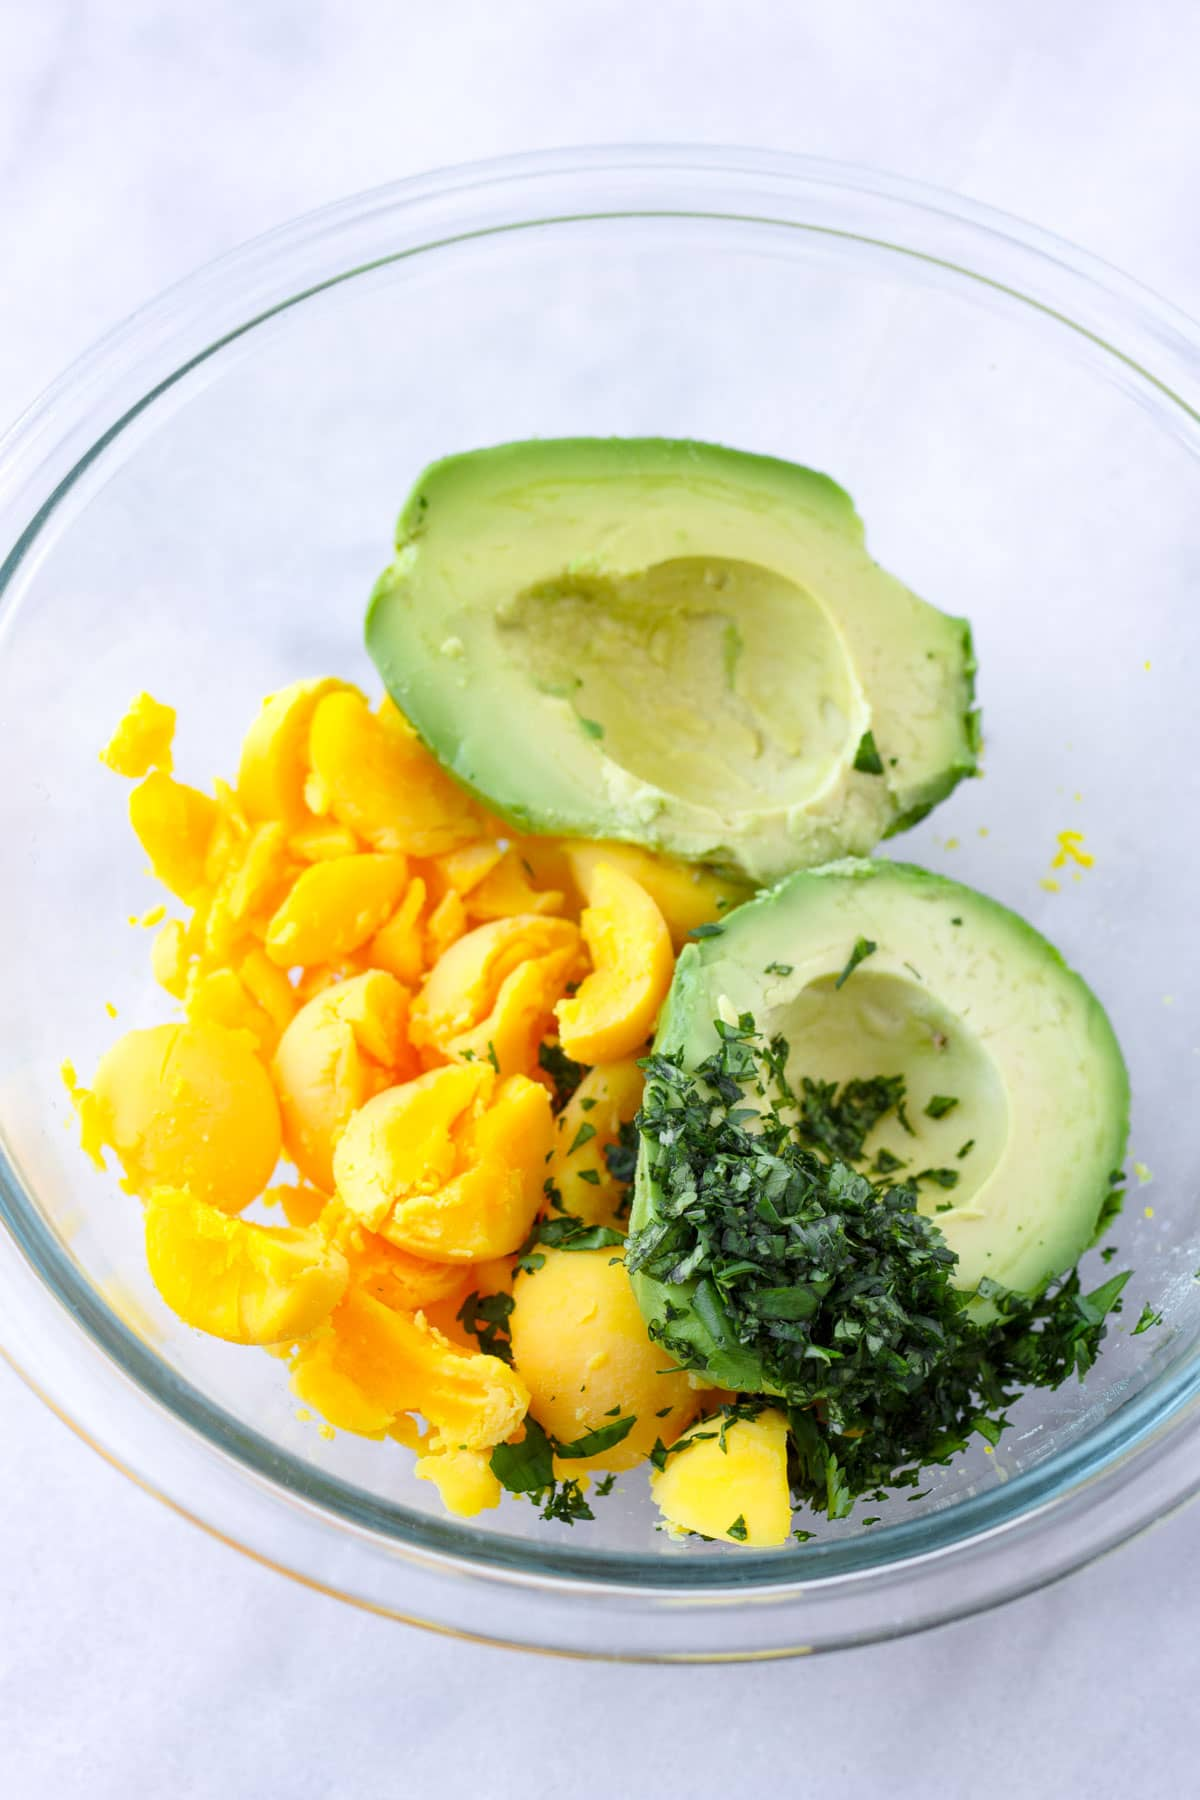 a glass bowl with egg yolks, avocado and chopped cilantro